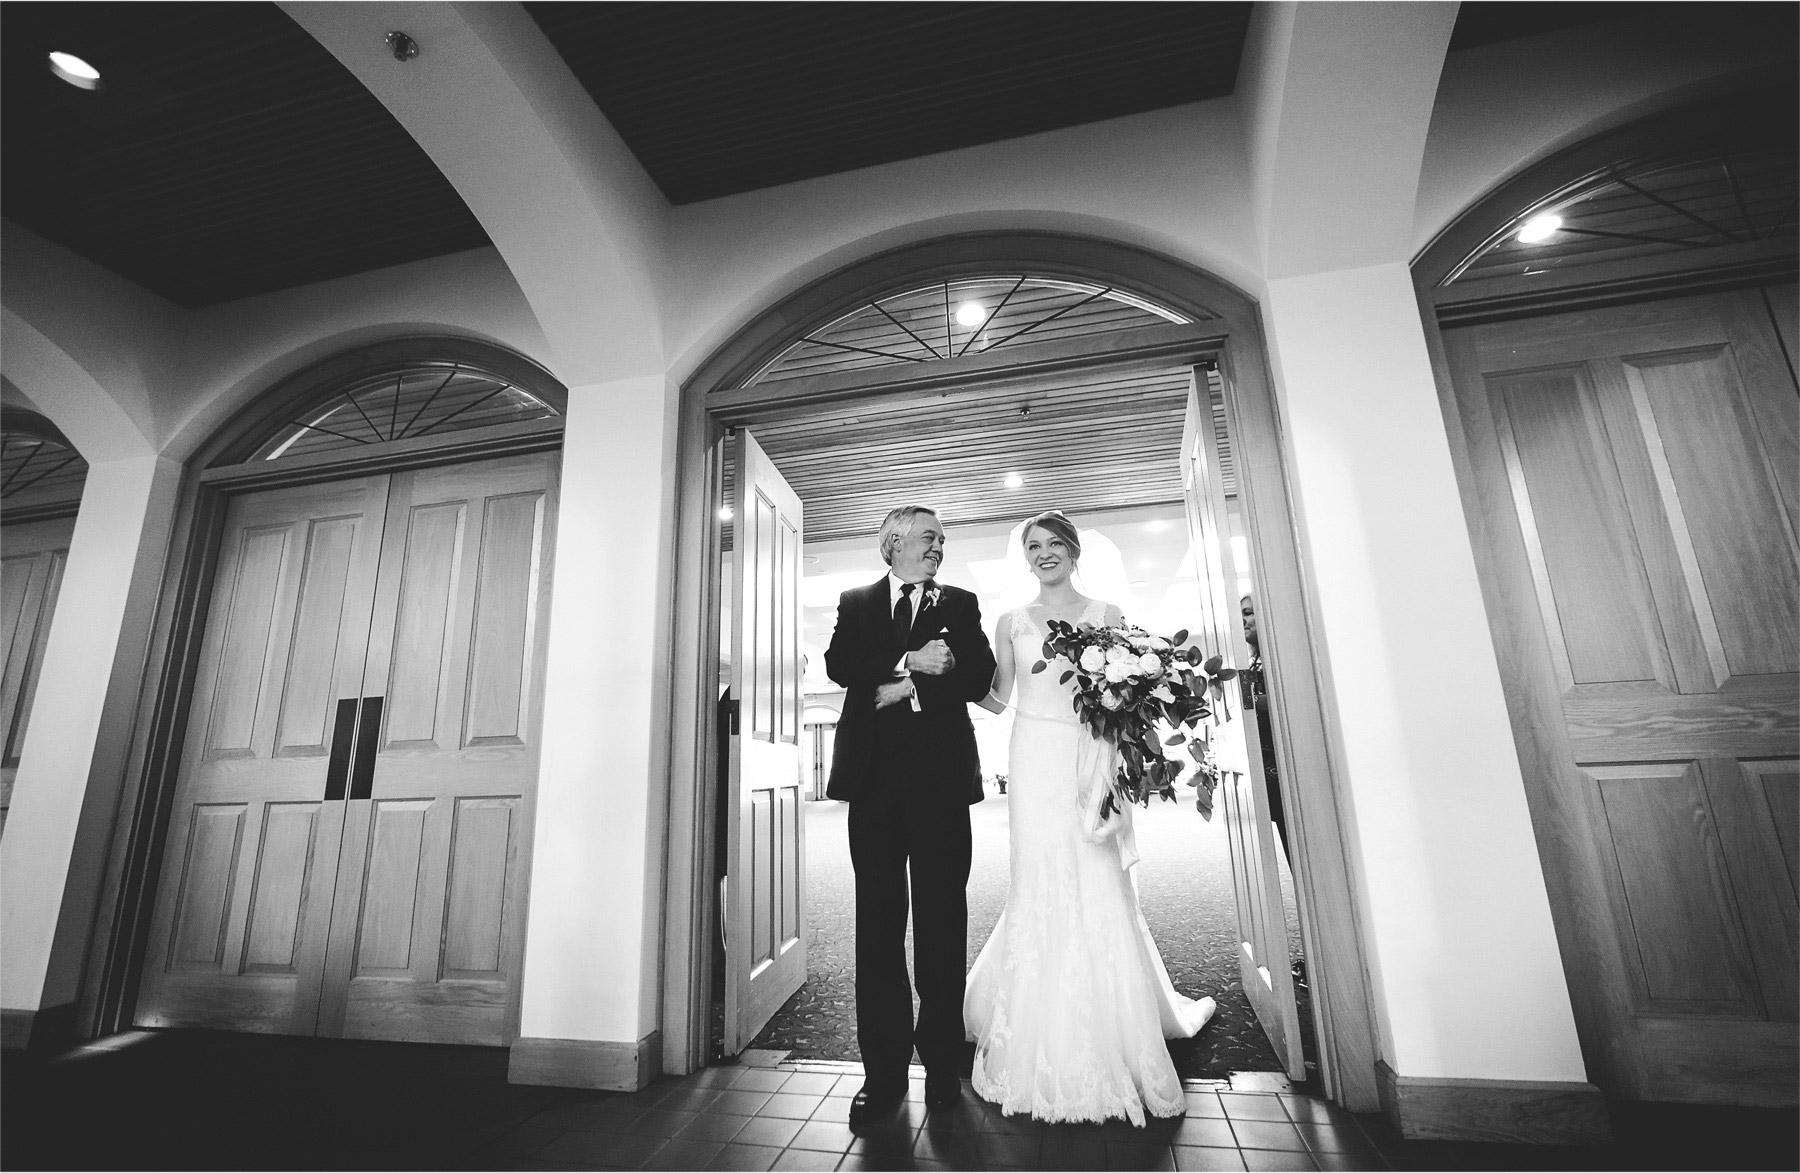 15-Edina-Minnesota-Wedding-Photographer-by-Andrew-Vick-Photography-Summer-Our-Lady-of-Grace-Catholic-Parish-Church-Ceremony-Bride-Falther-Parents-Black-White-Betsy-and-Jon.jpg